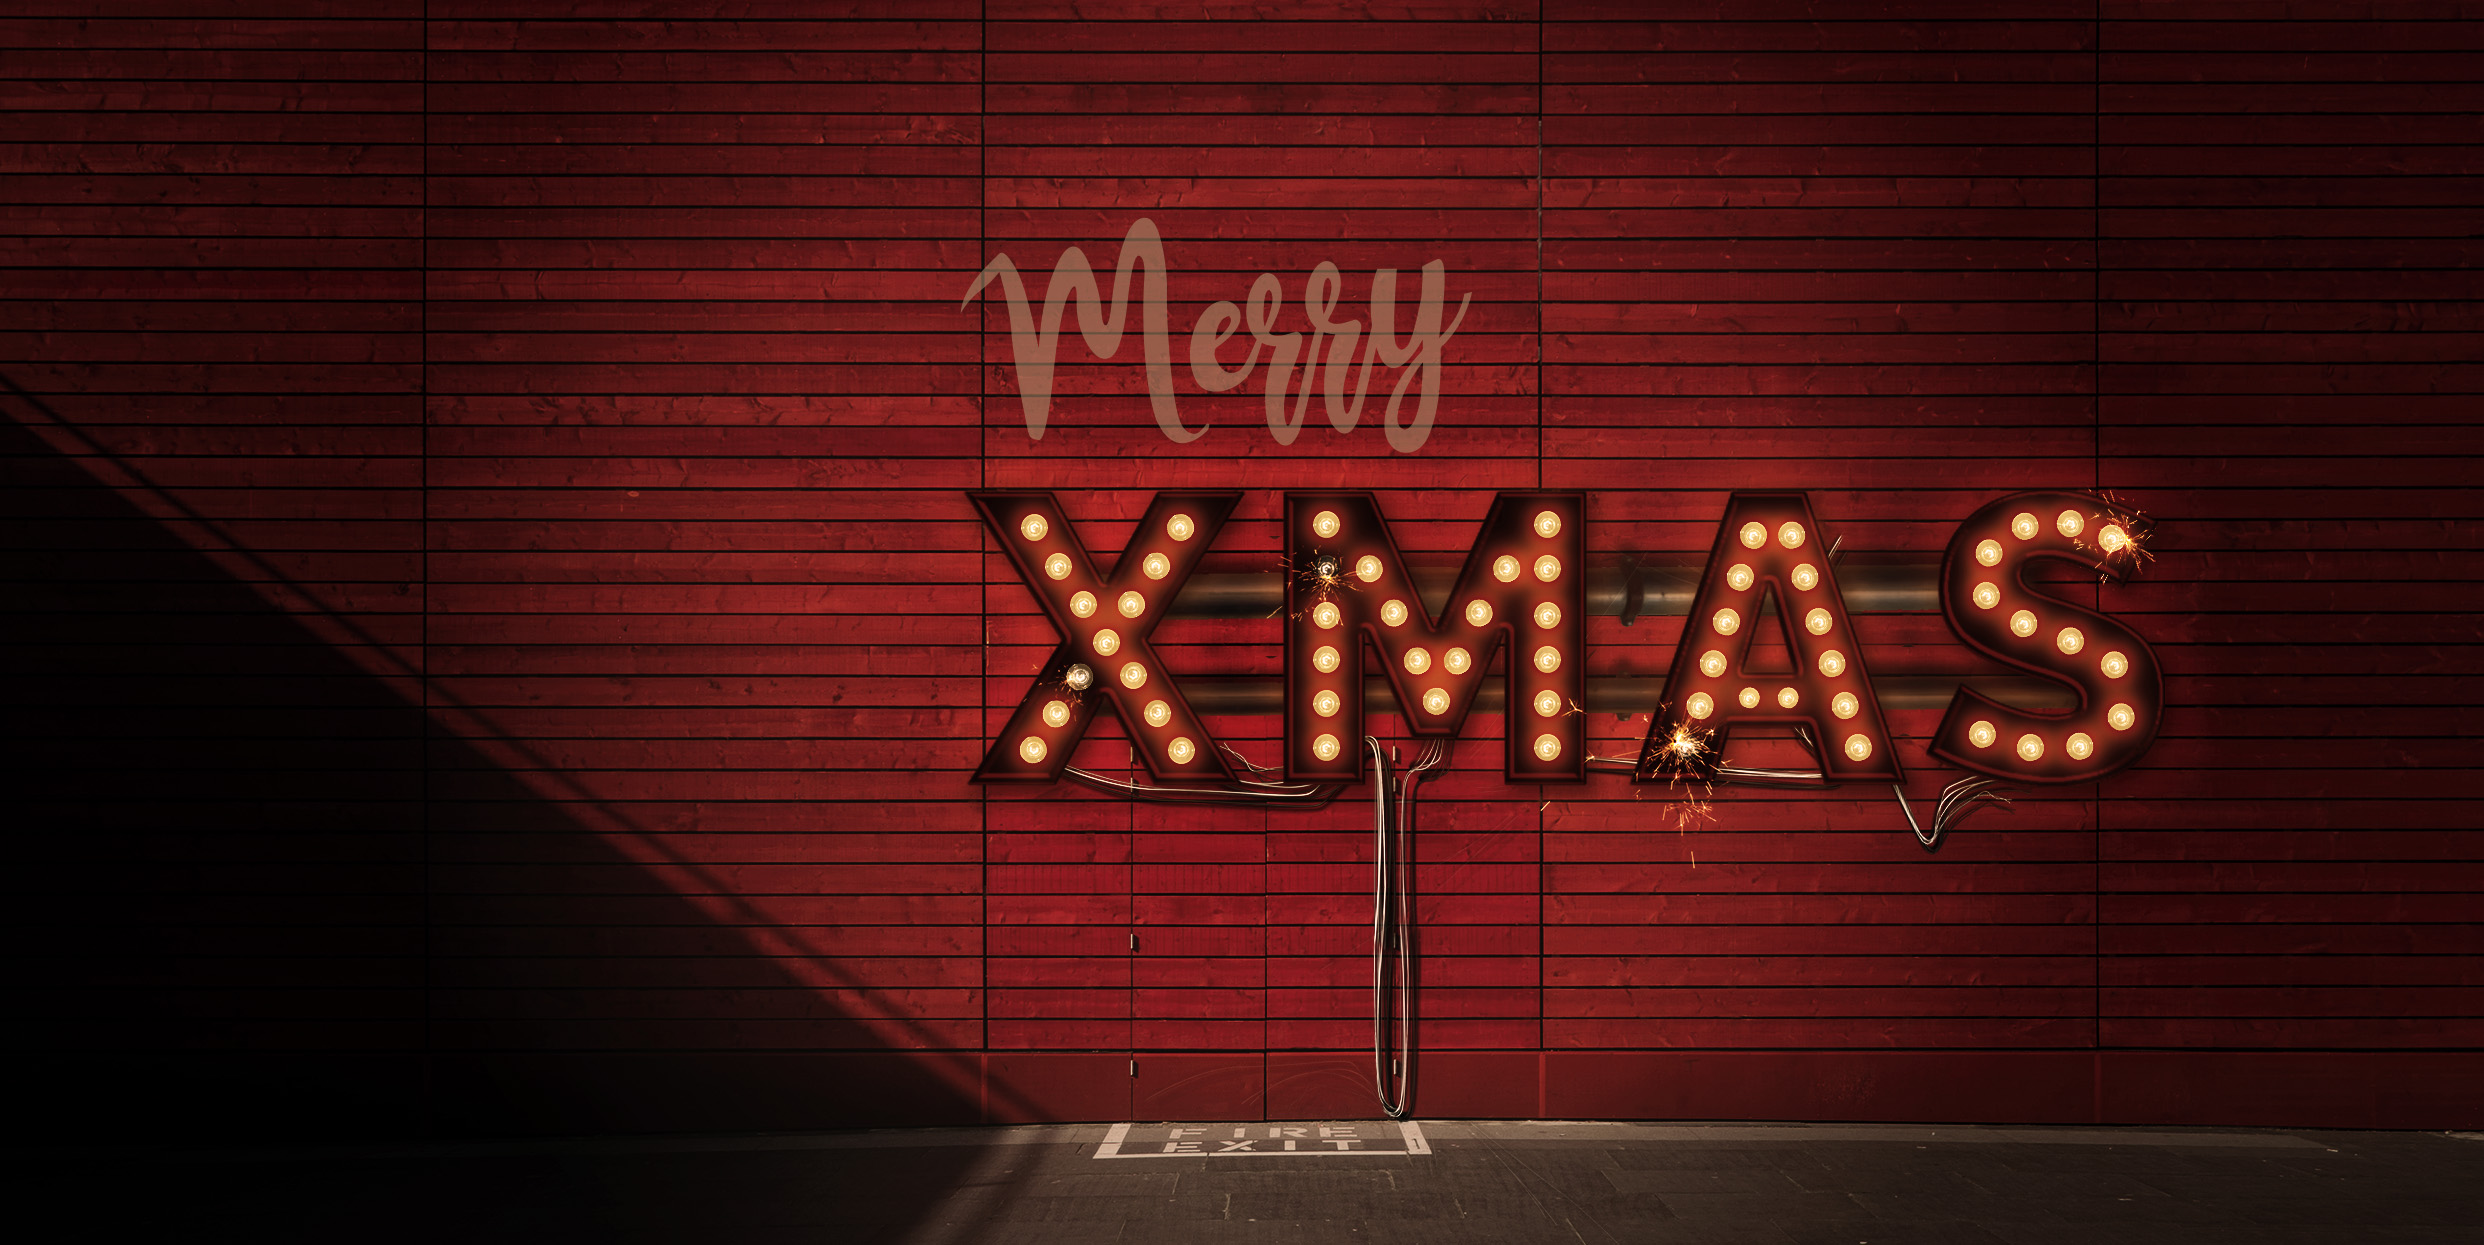 Lightbulb Merry Christmas Signs | 14-Image Bundle example image 5